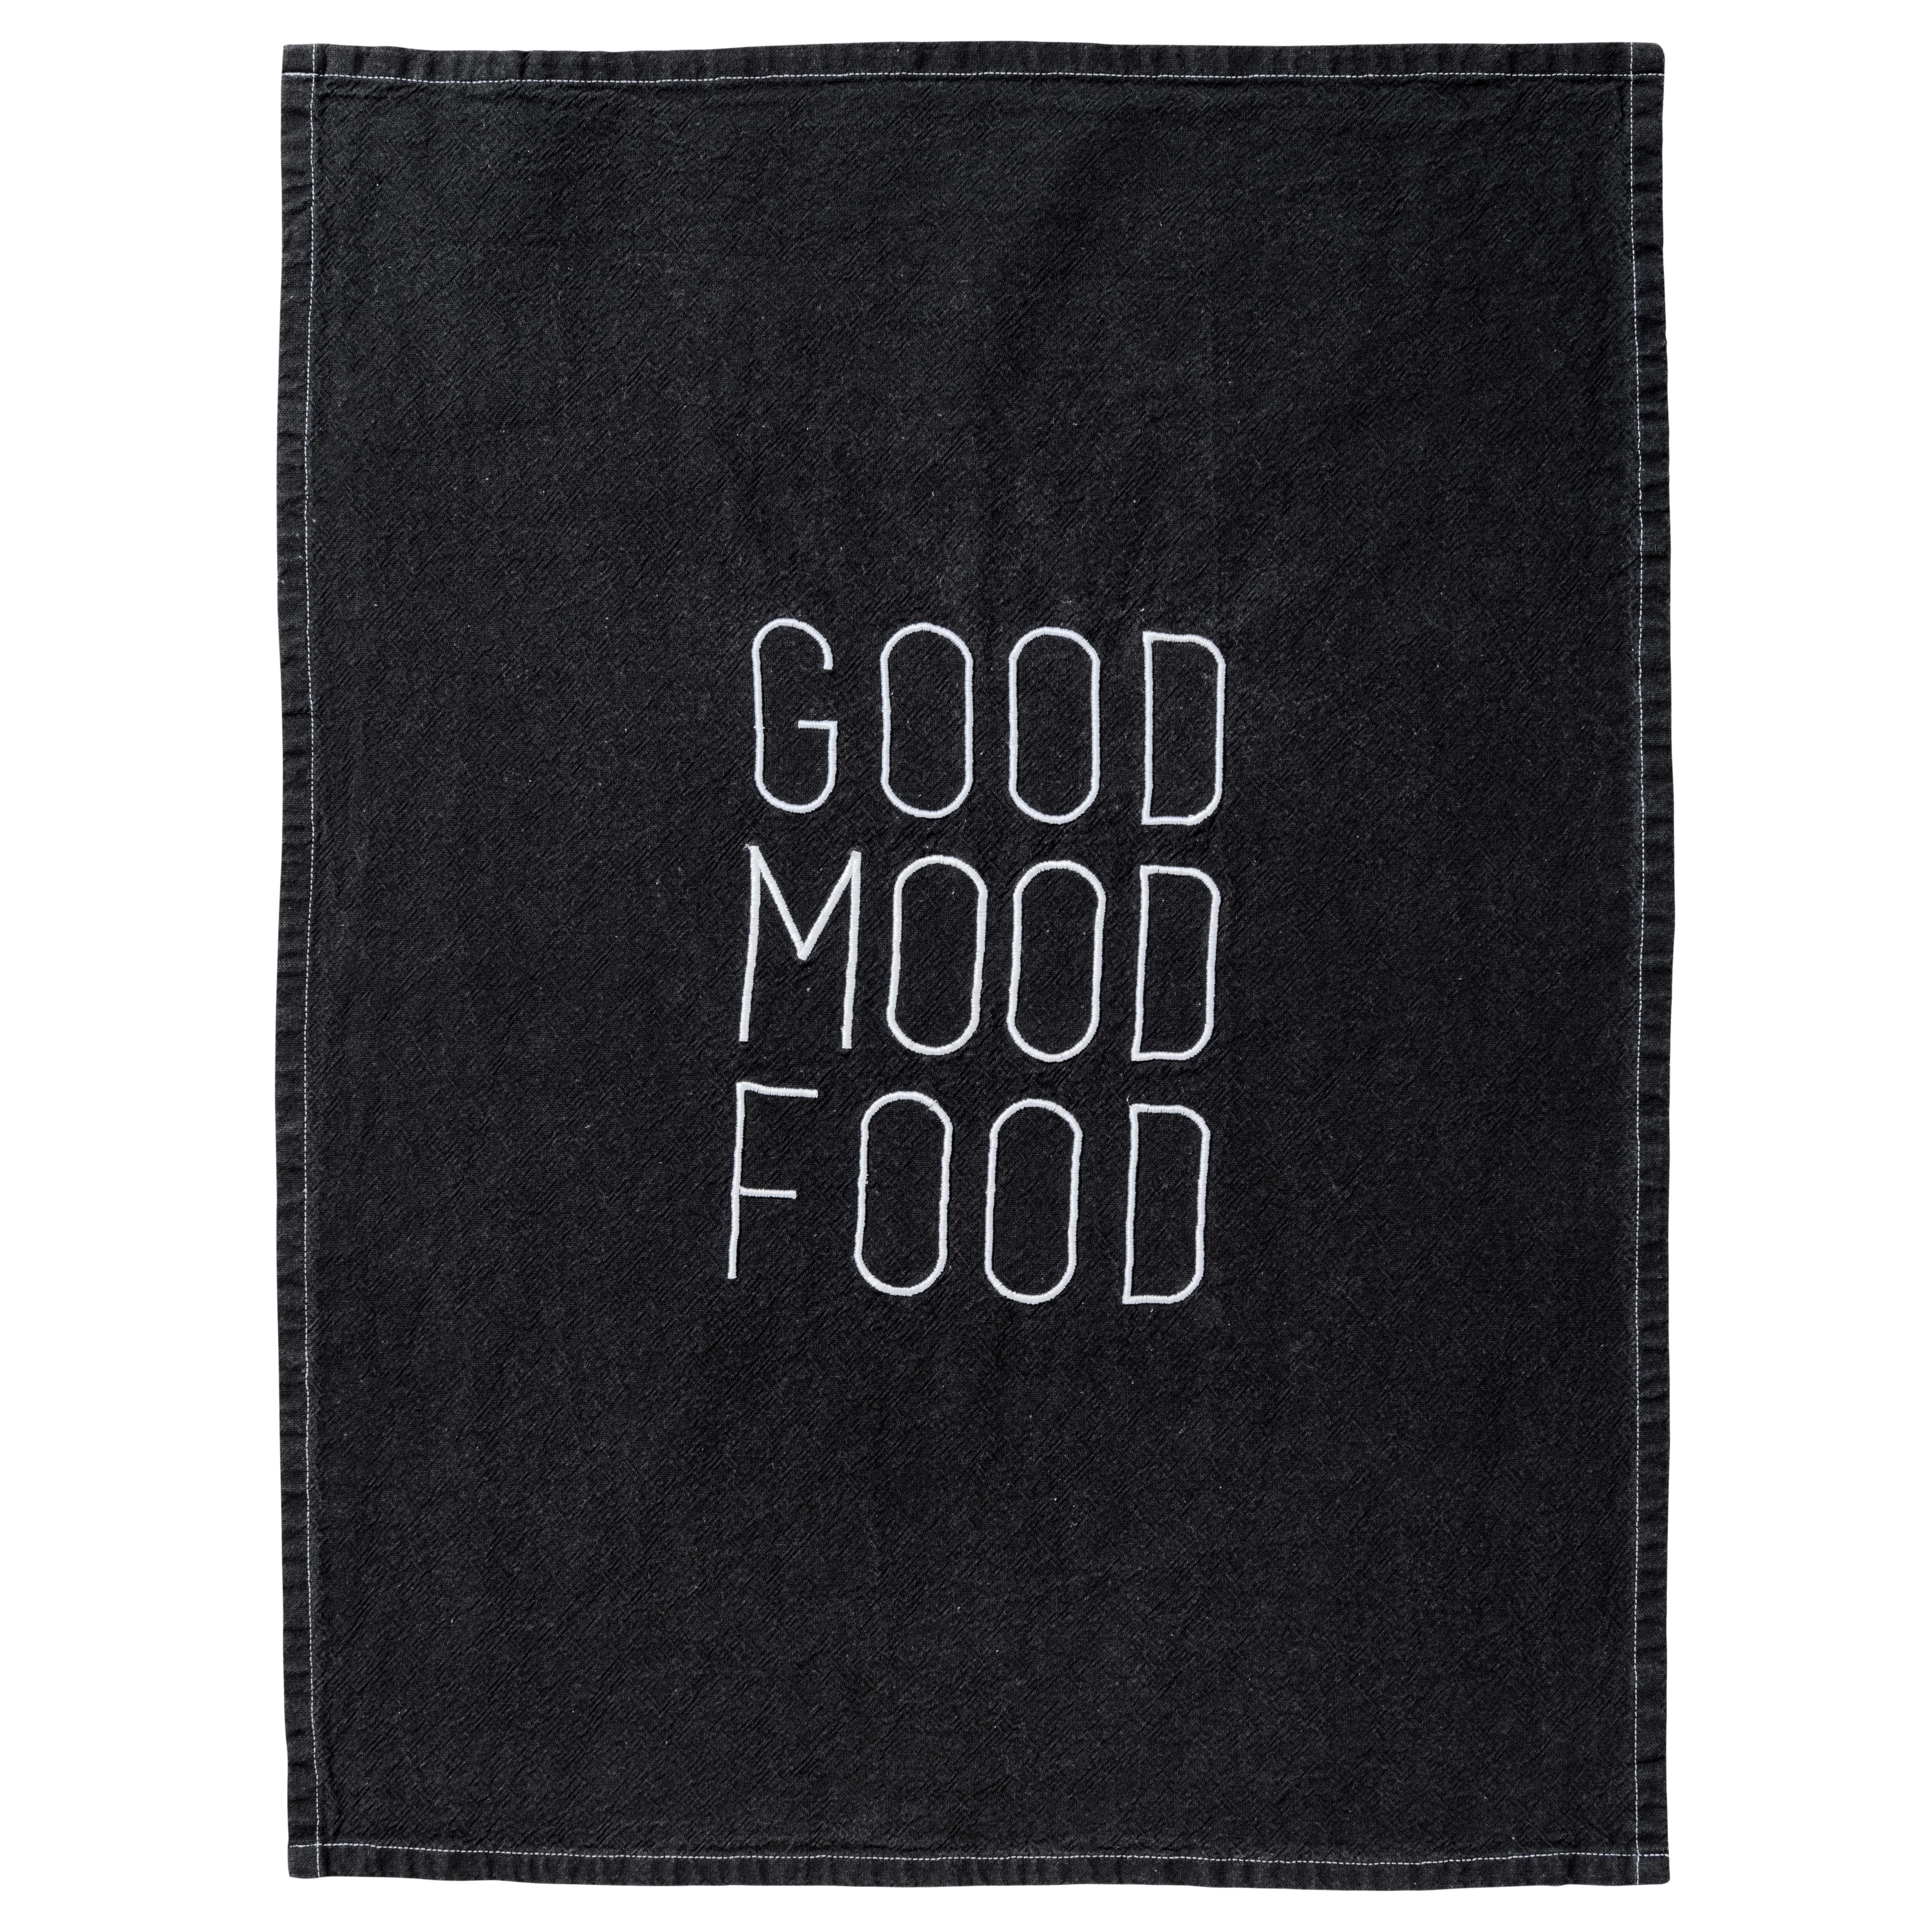 Geschirrtuch - Good Modd Food - räder